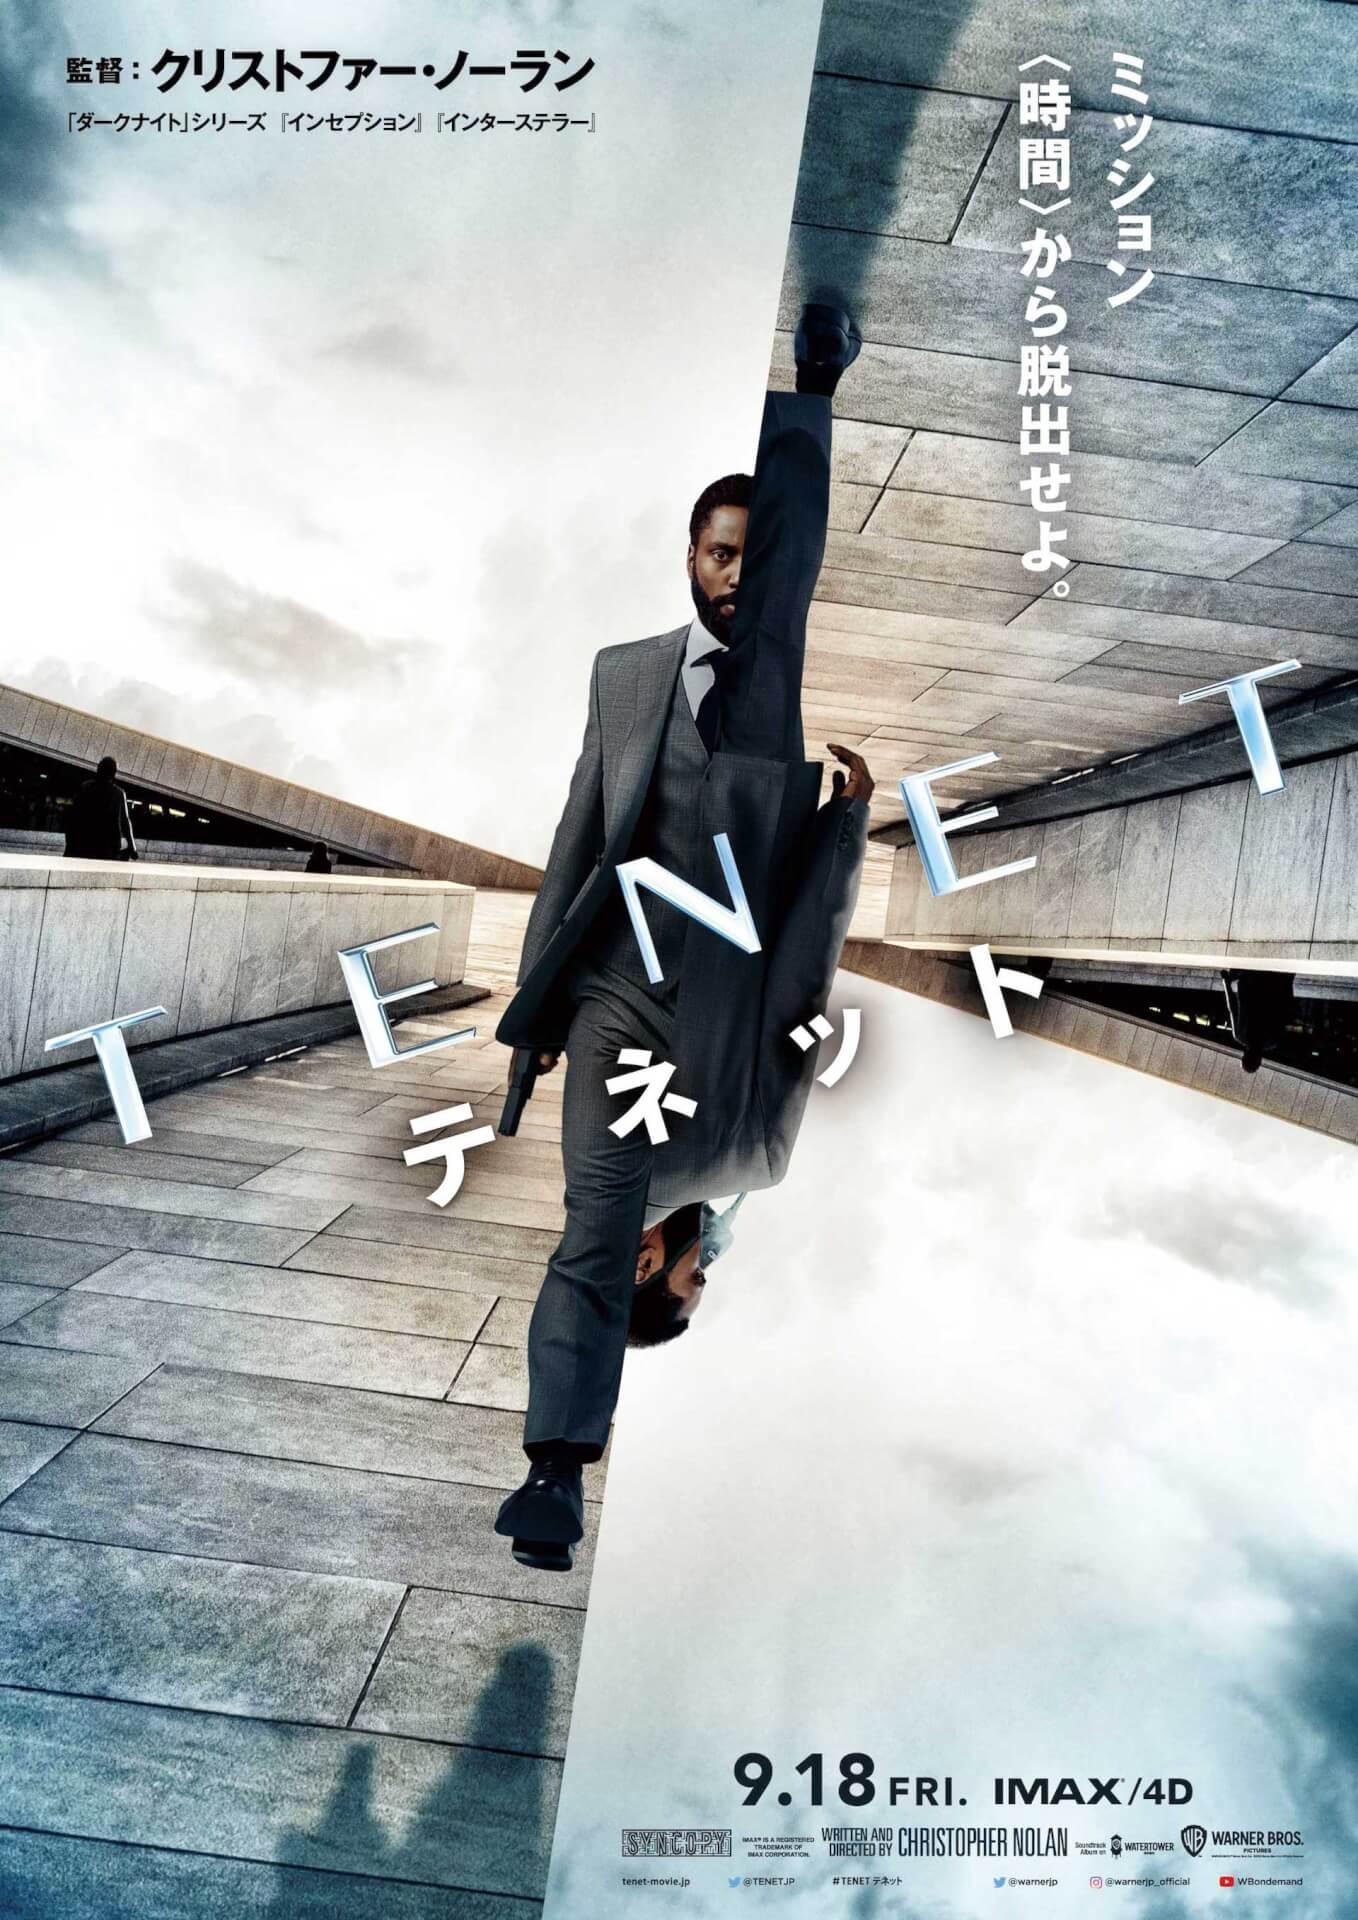 『TENET テネット』監督クリストファー・ノーランから直筆の感謝状がグランドシネマサンシャインに!IMAX®シアター世界第1位の成績を達成 film201016_tenet_2